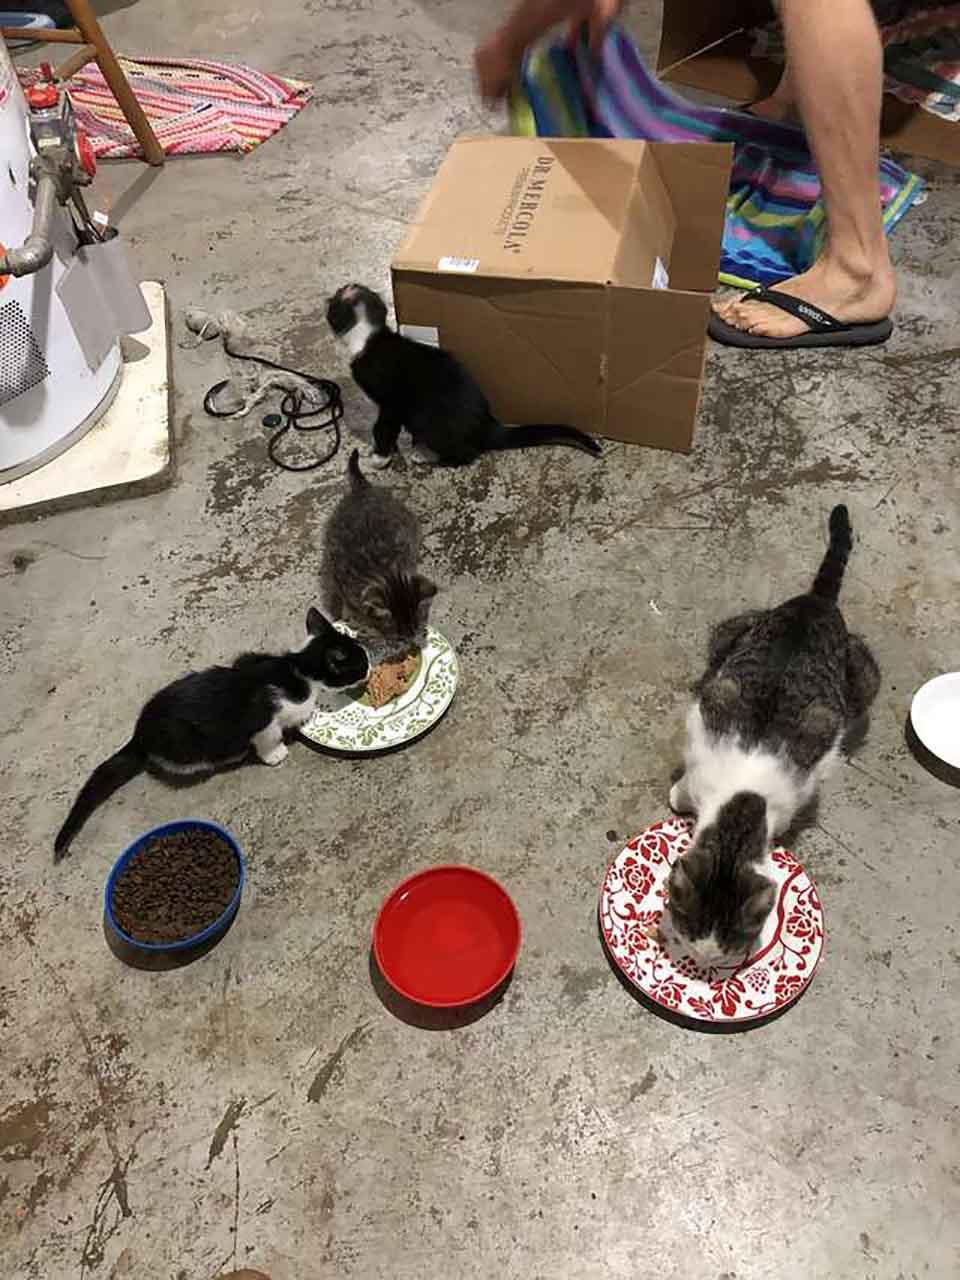 Gatitos alimentandose